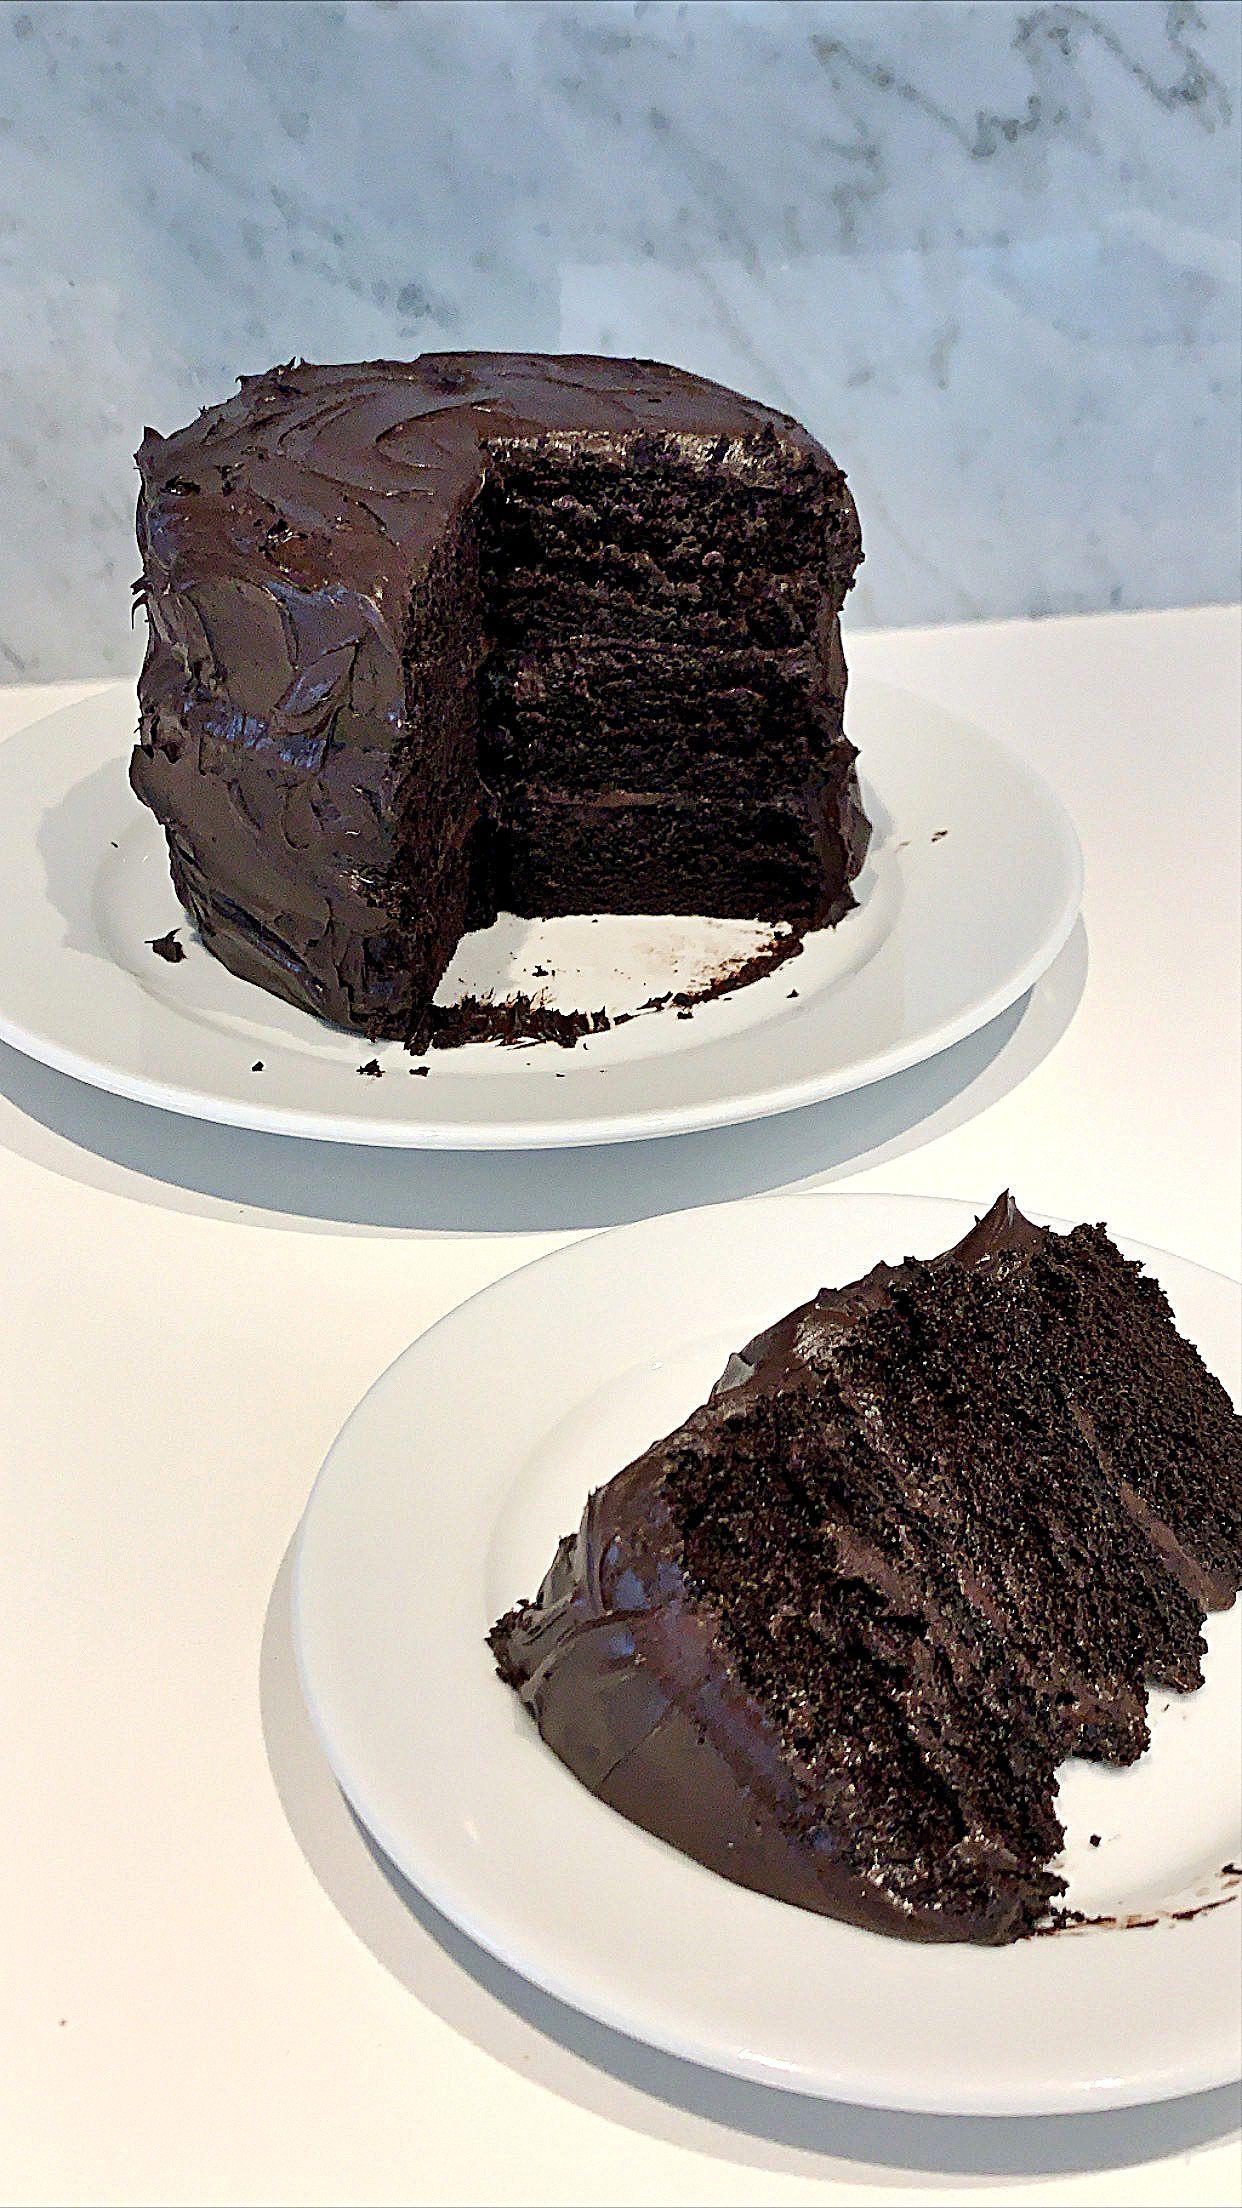 Matilda Chocolate Cake Recipe with Glossy Chocolate Sour Cream Frosting